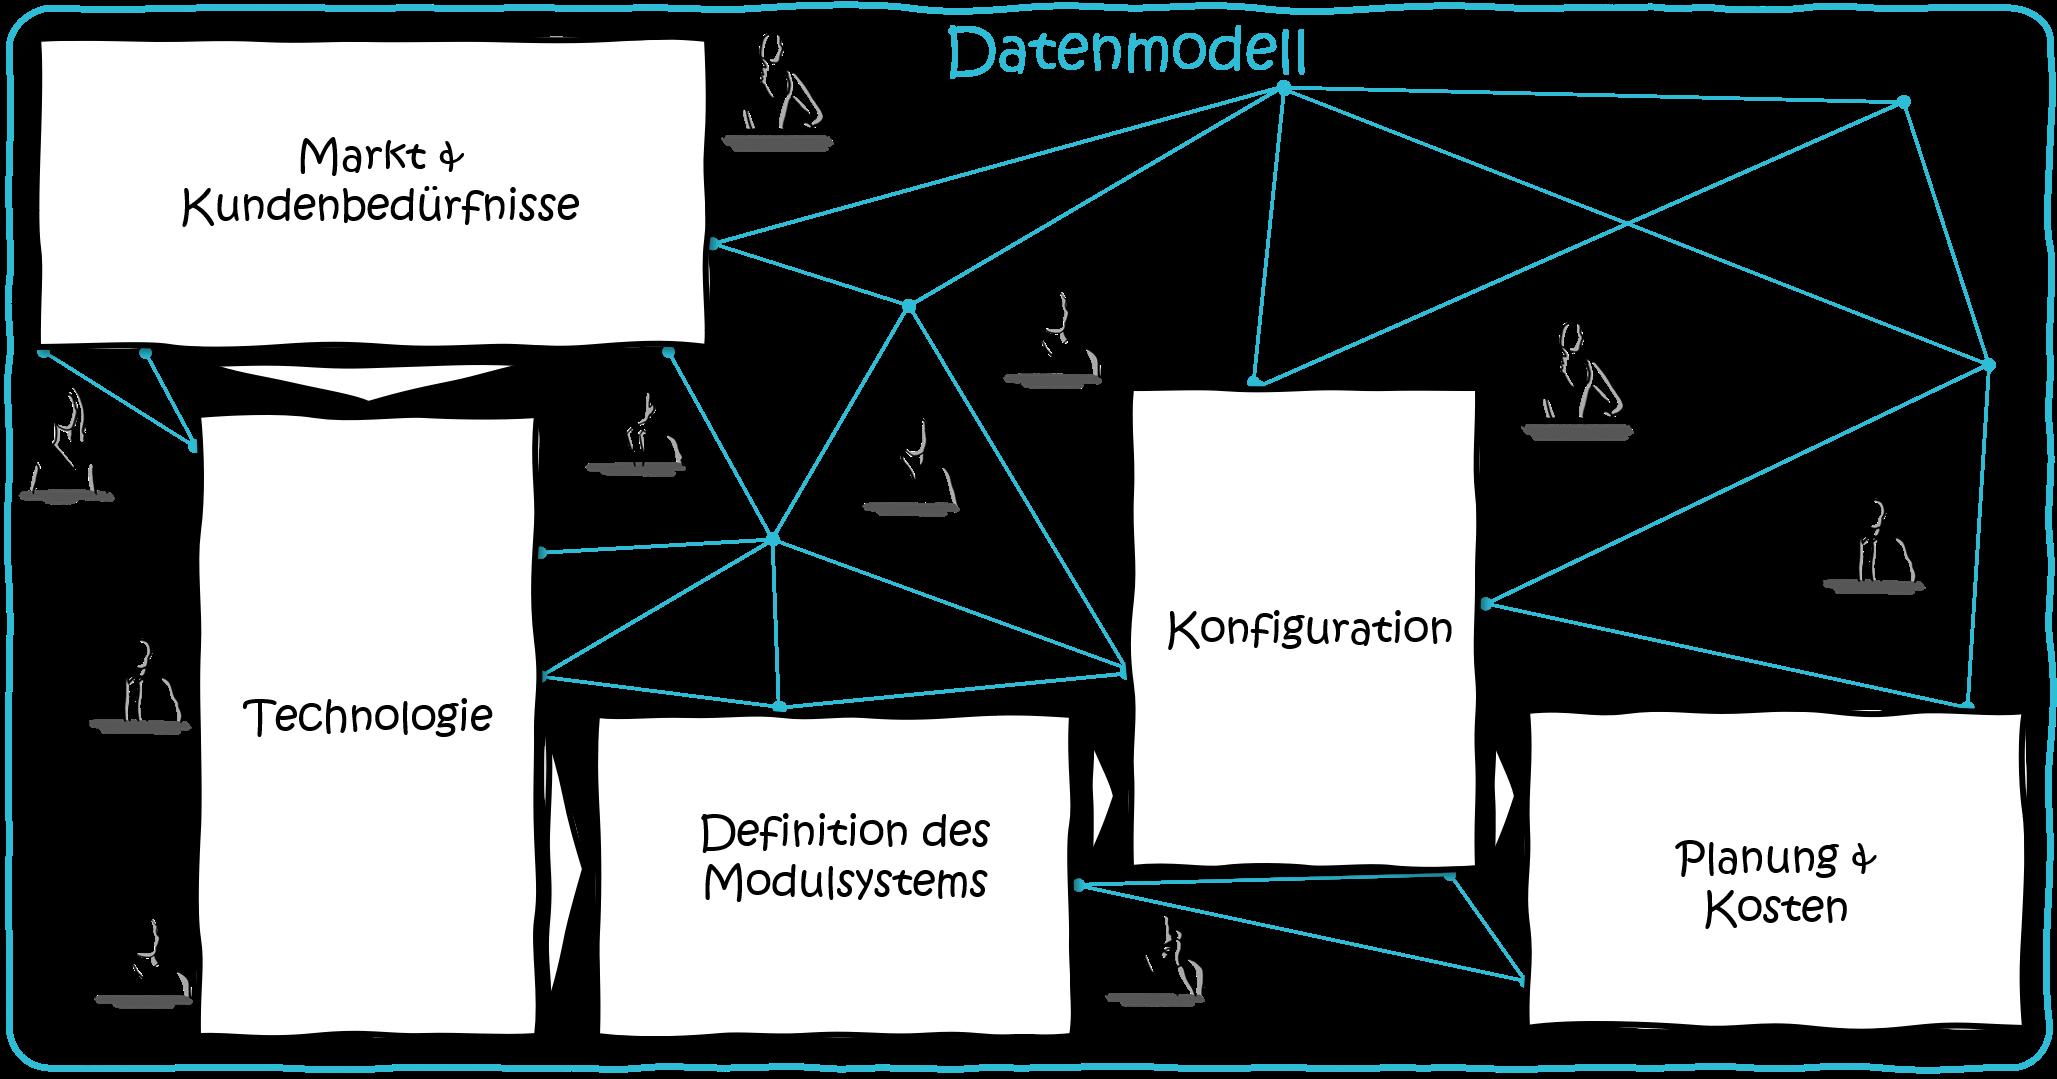 Modularisierung-Software-Datenmodell